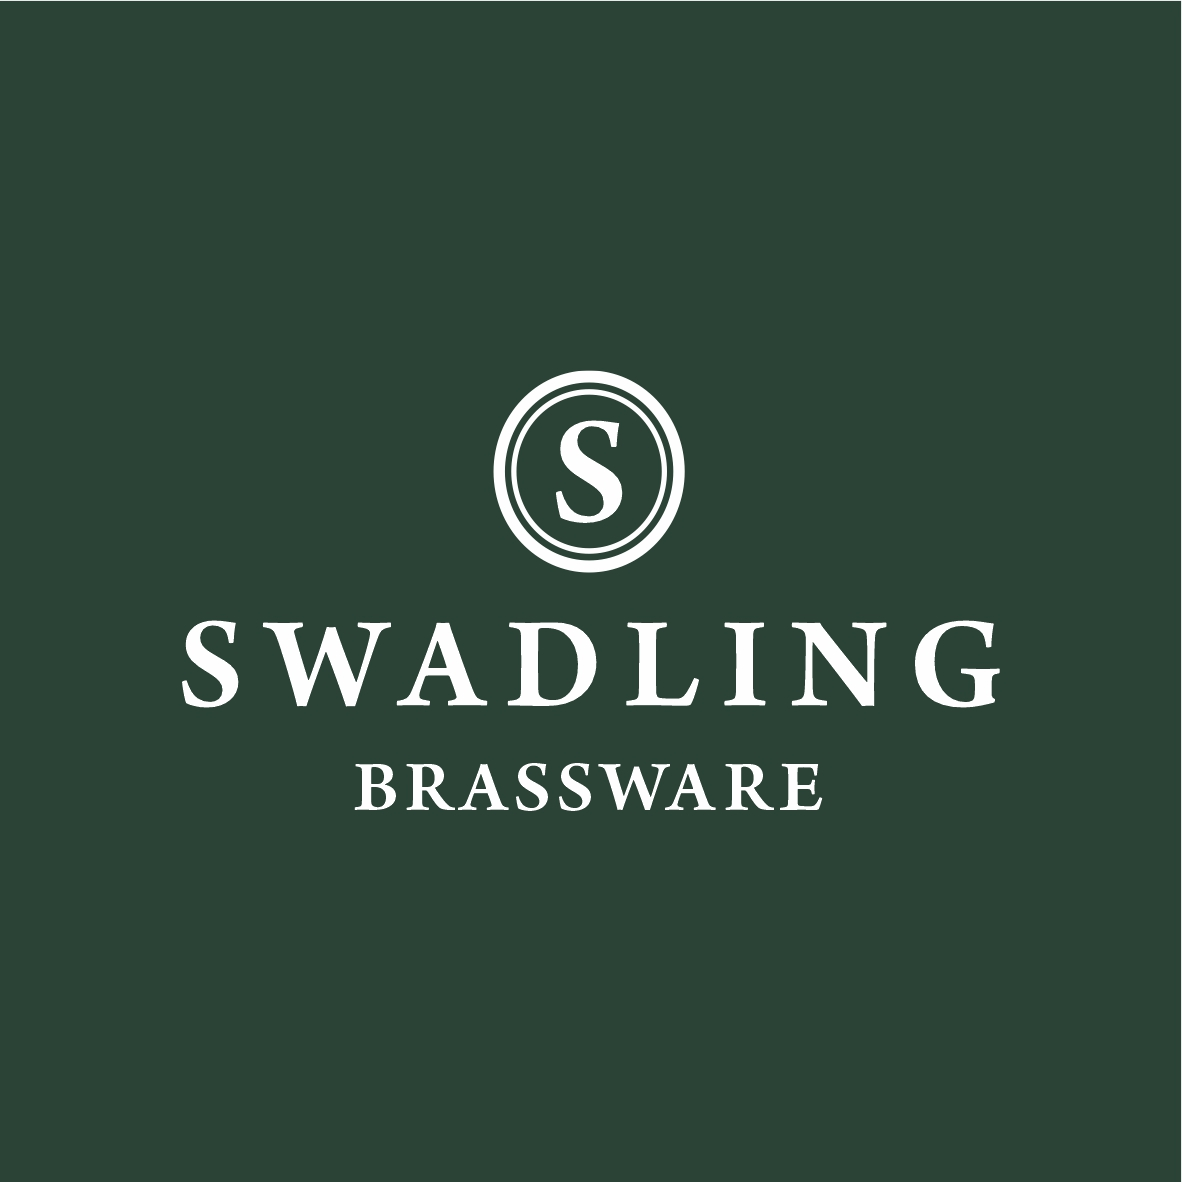 SWADLING BRASSWARE